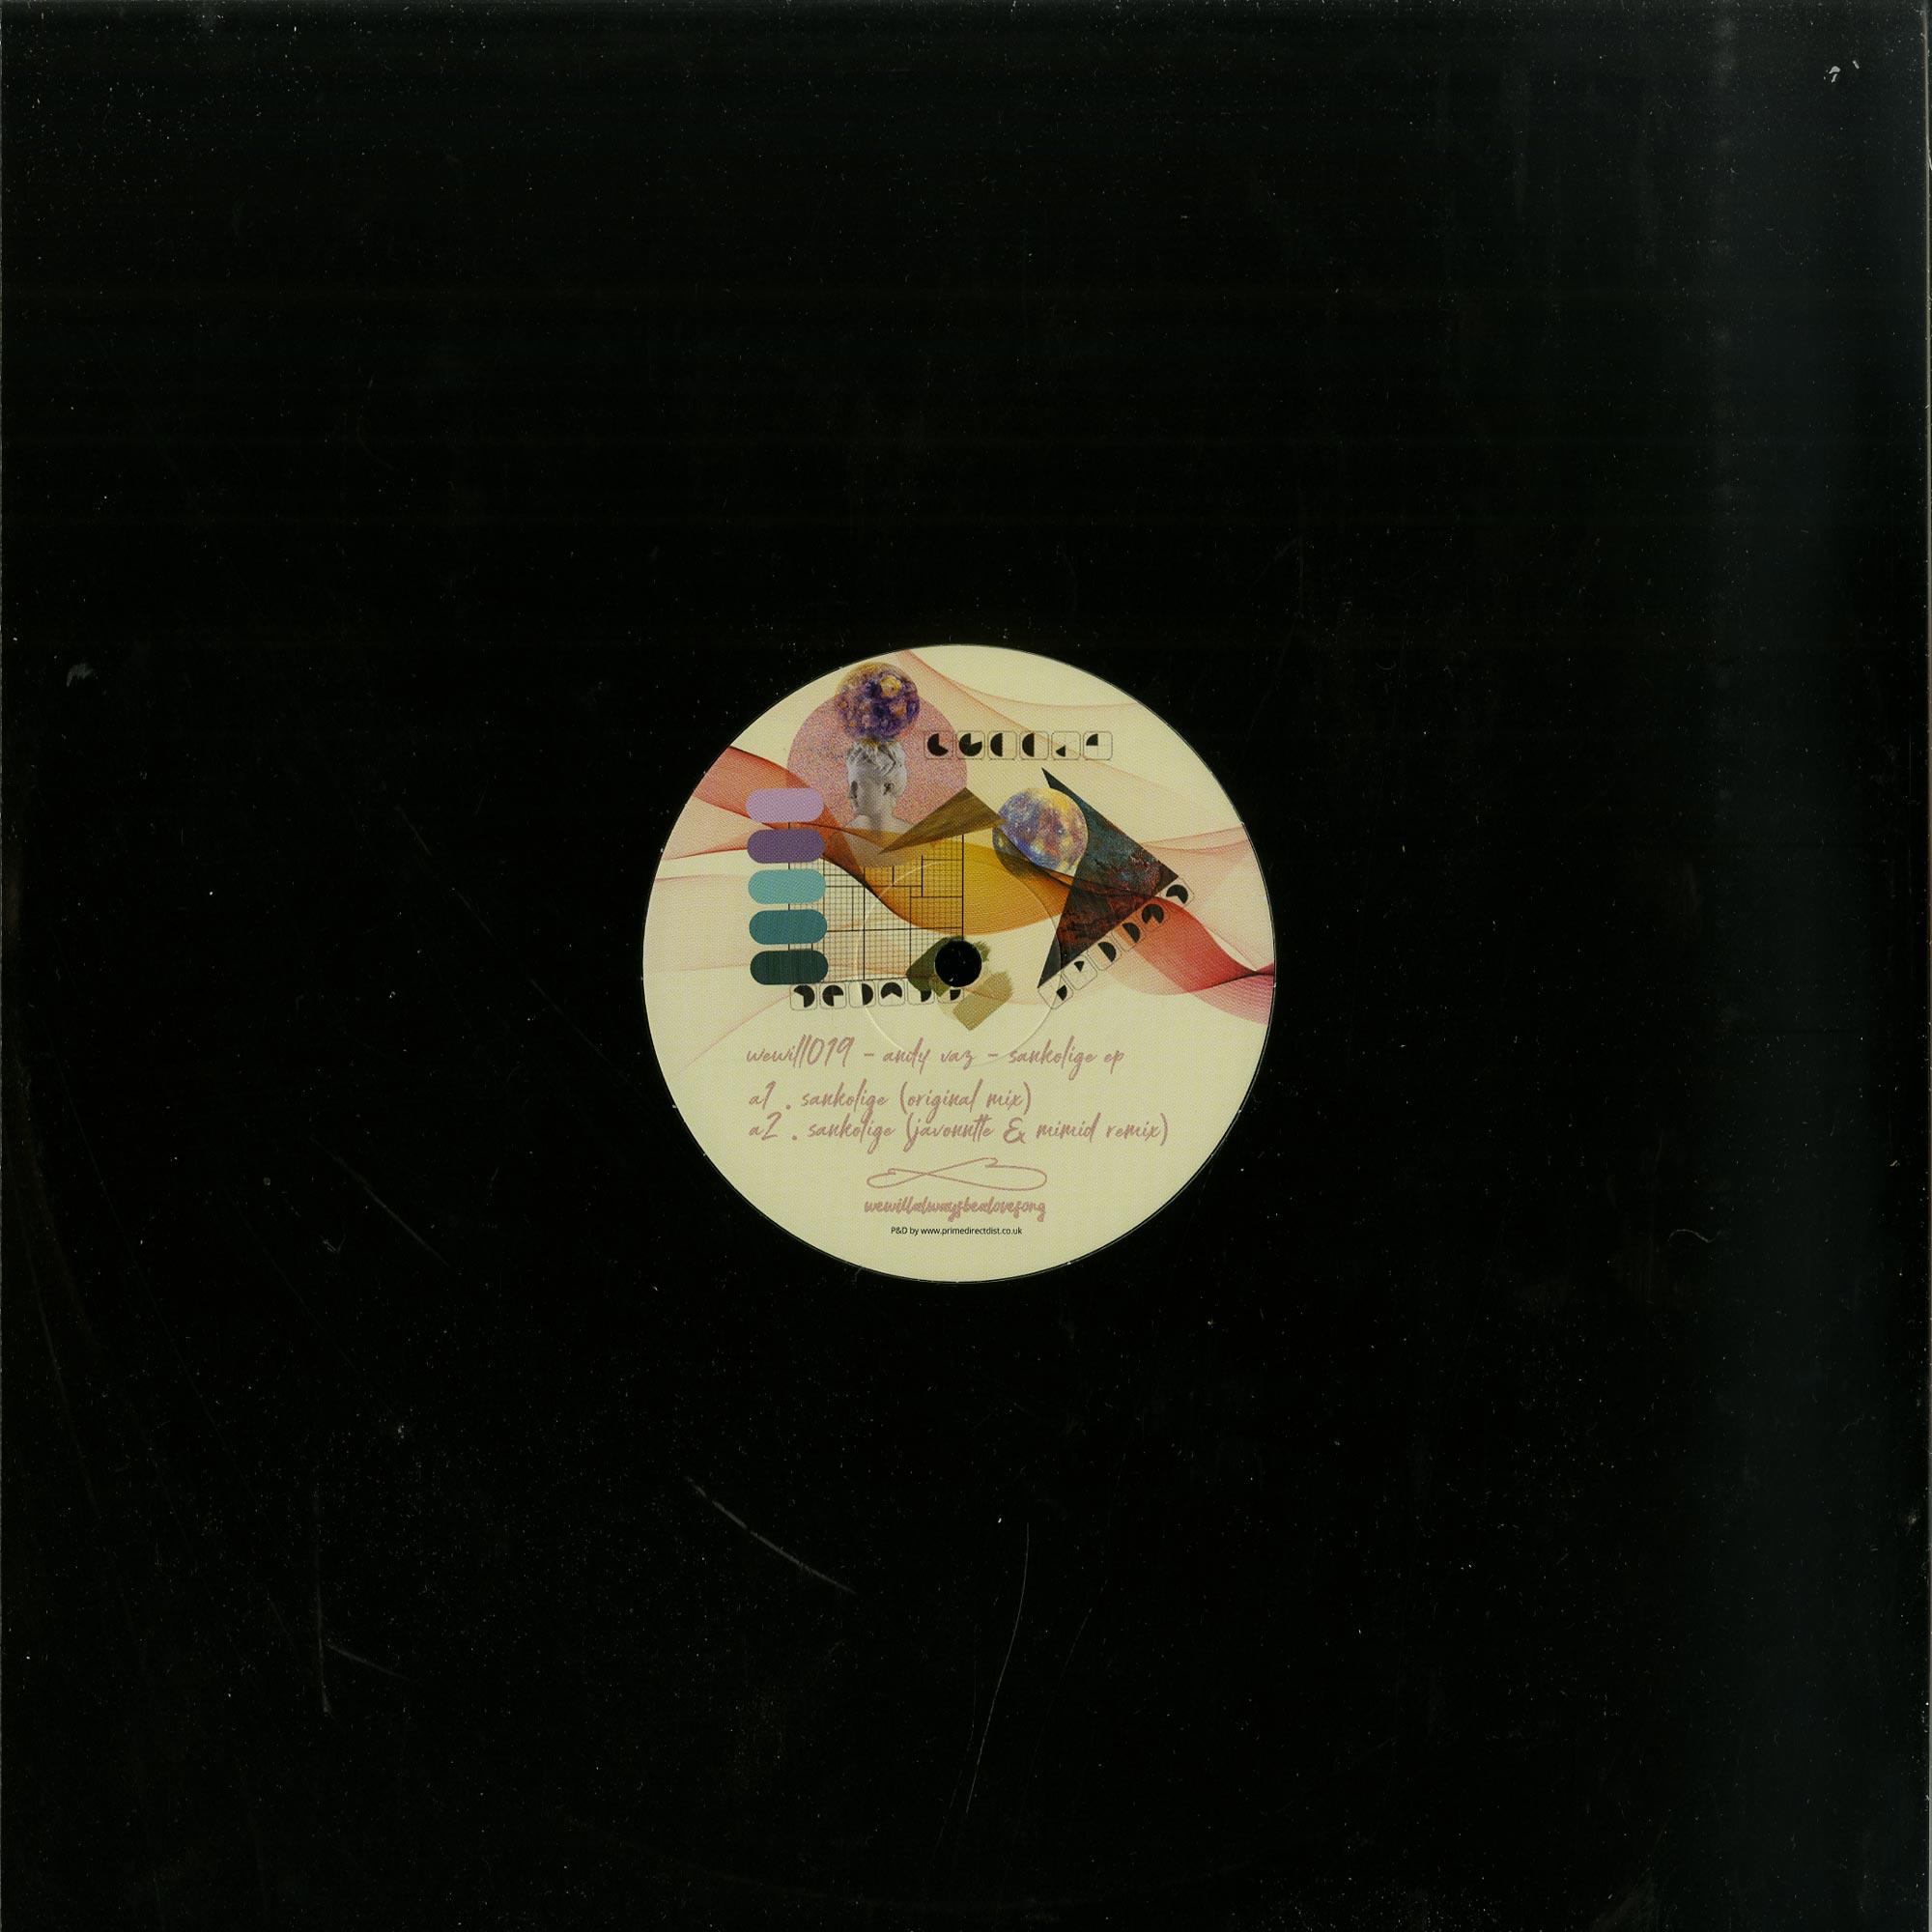 Andy Vaz - SANKOLIGE EP